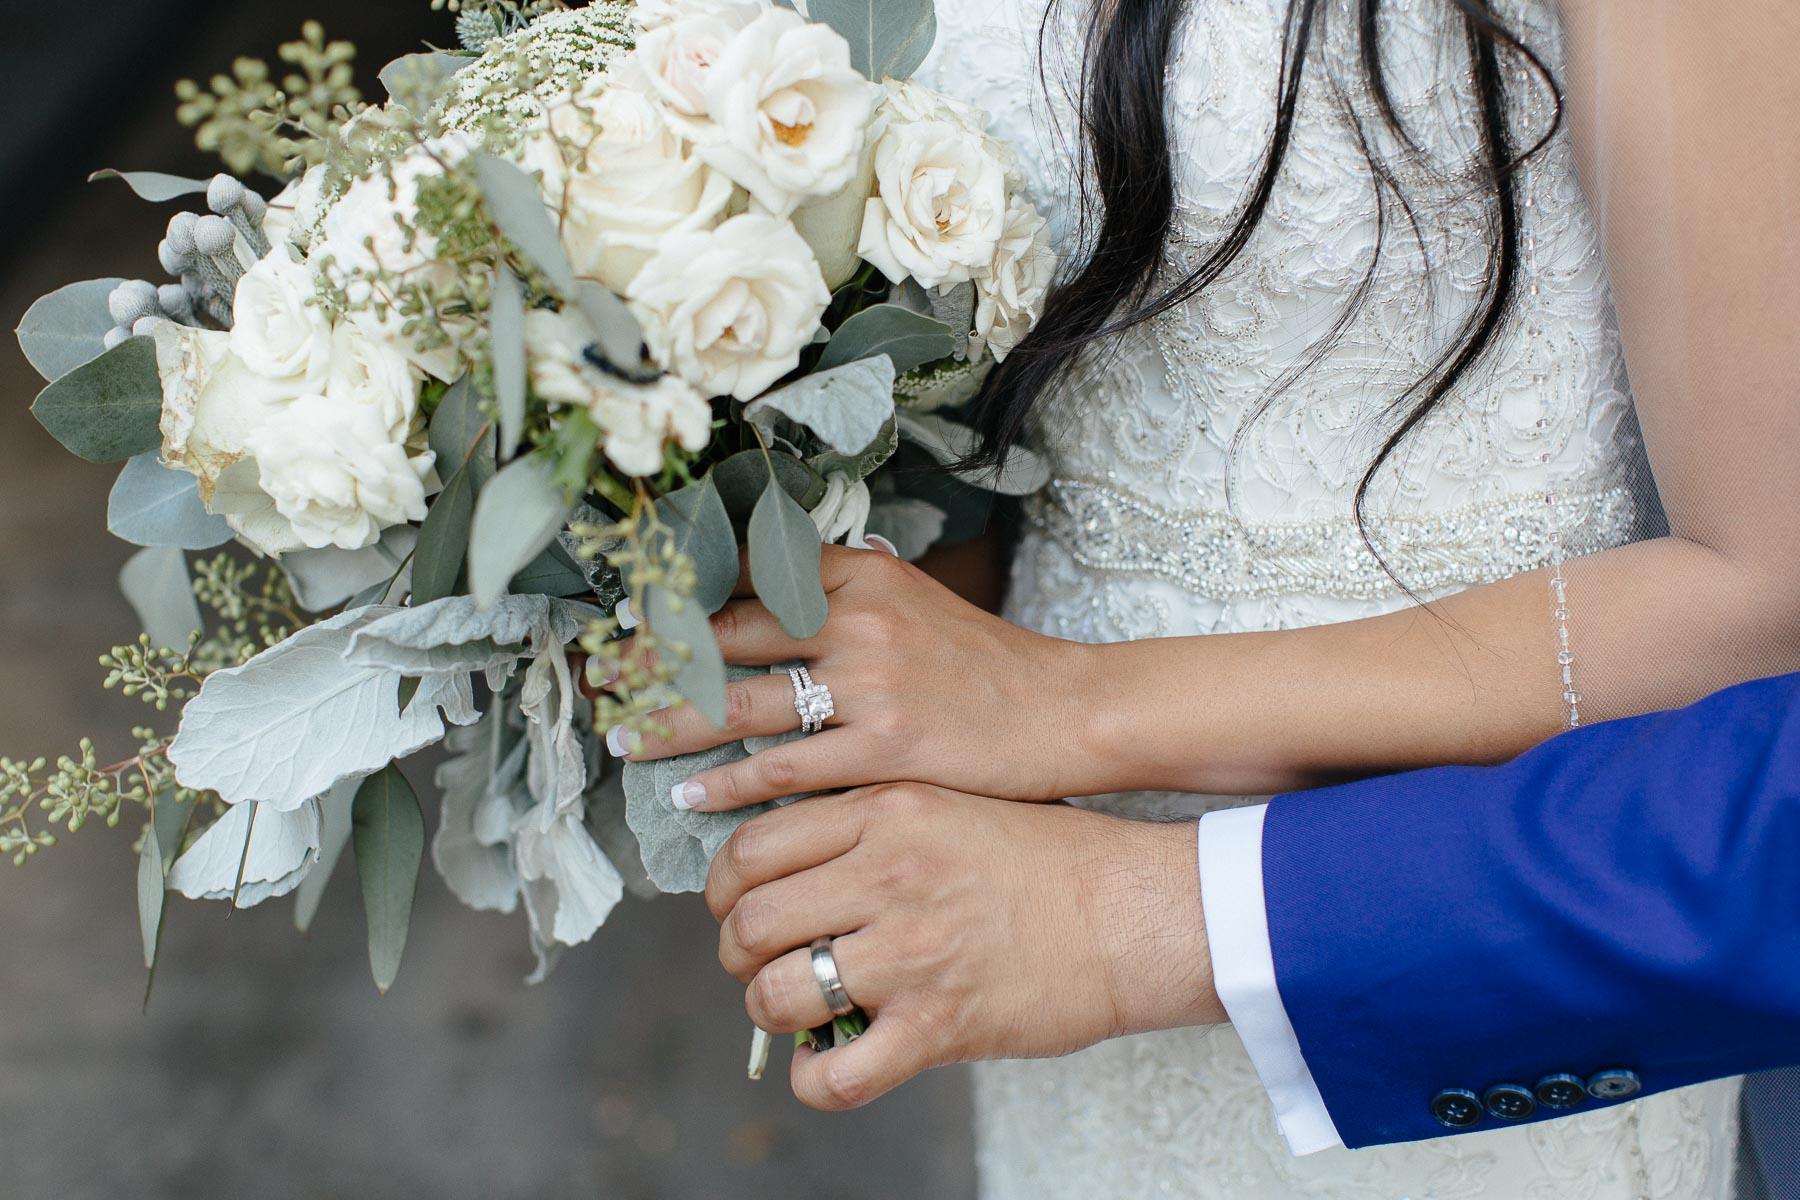 161029-Luxium-Weddings-Arizona-Jeff-Griselda-First-Look-Val-Vista-Lakes-Gilber-066.jpg